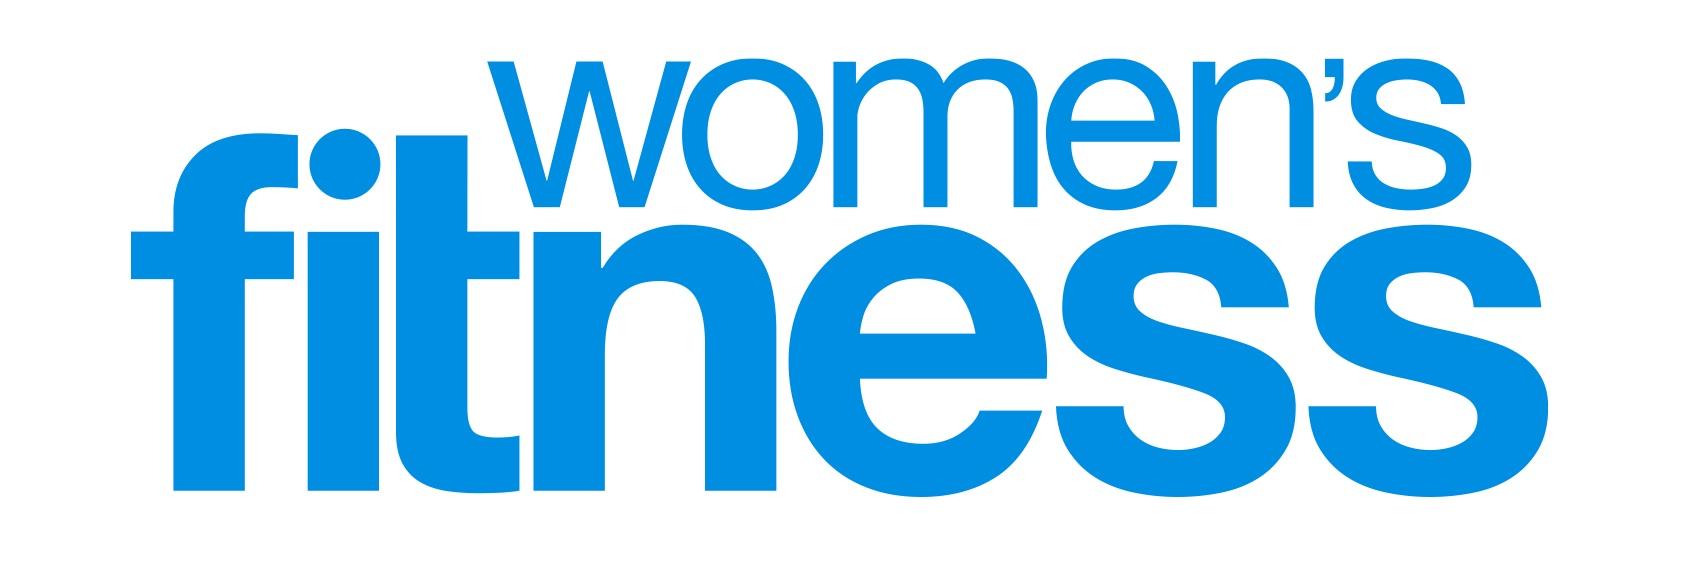 womensfitness_logo.jpg